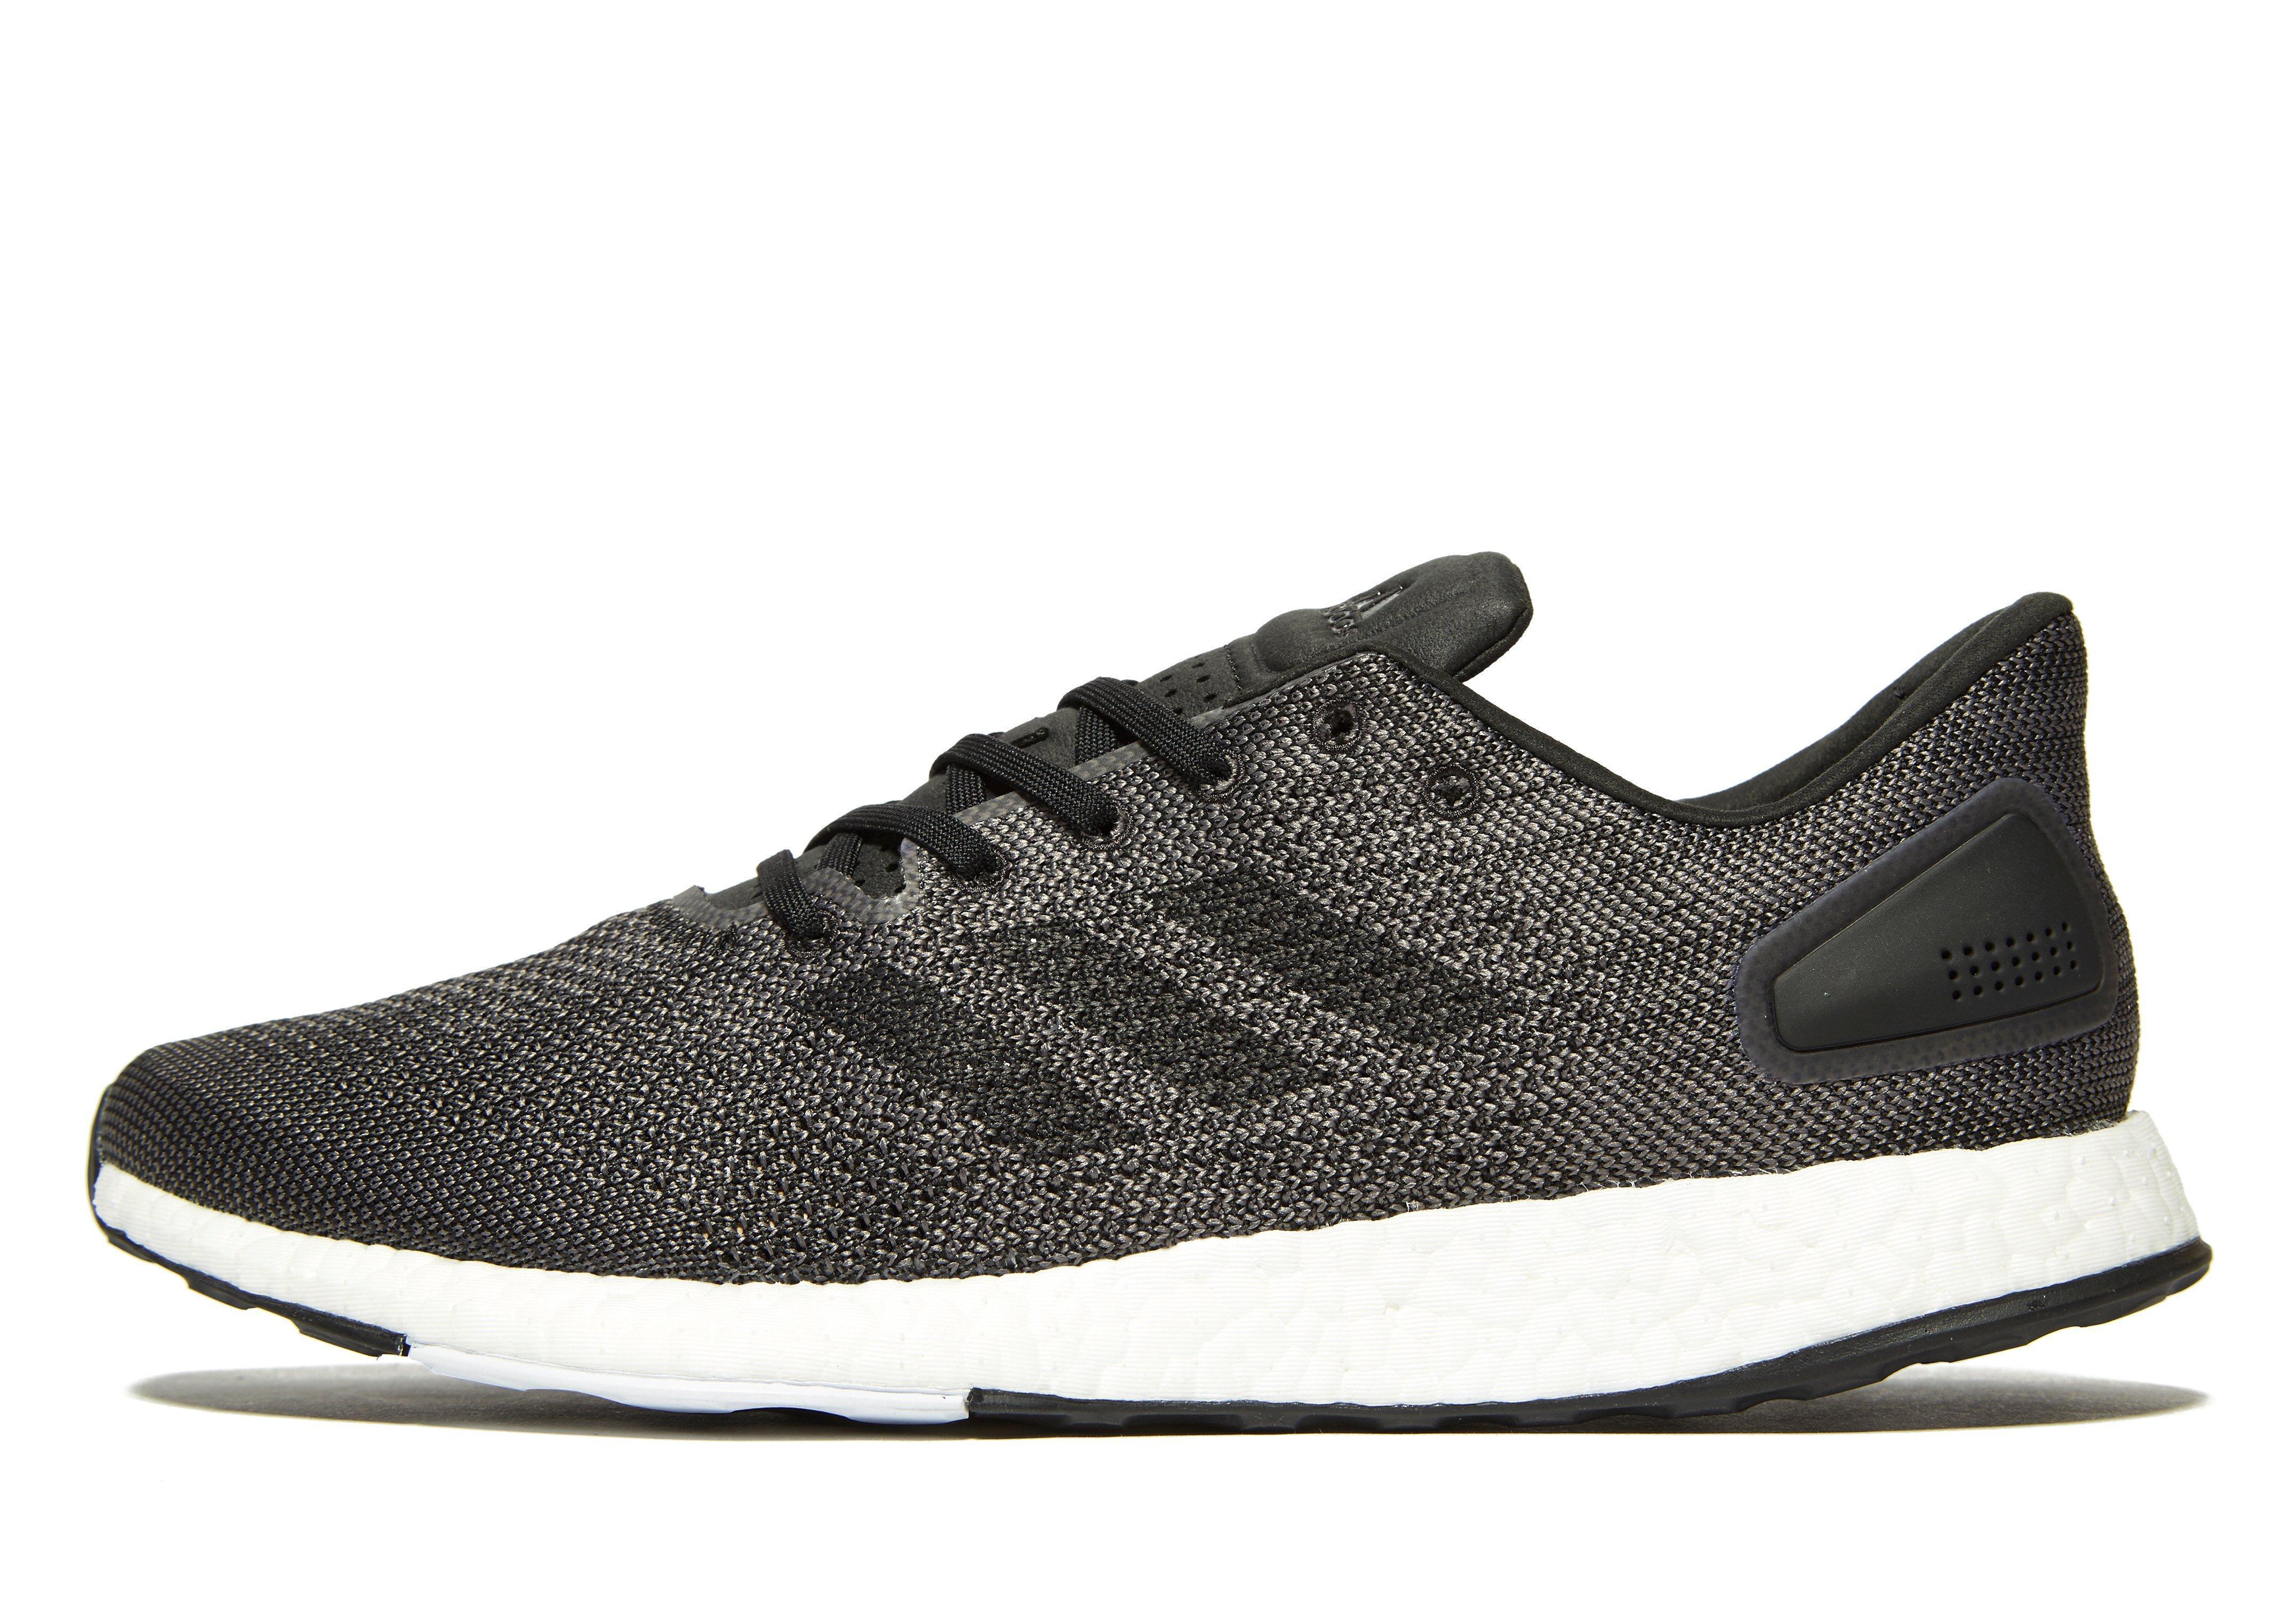 70ae06f4e507f adidas Pure Boost Dpr in Black for Men - Lyst